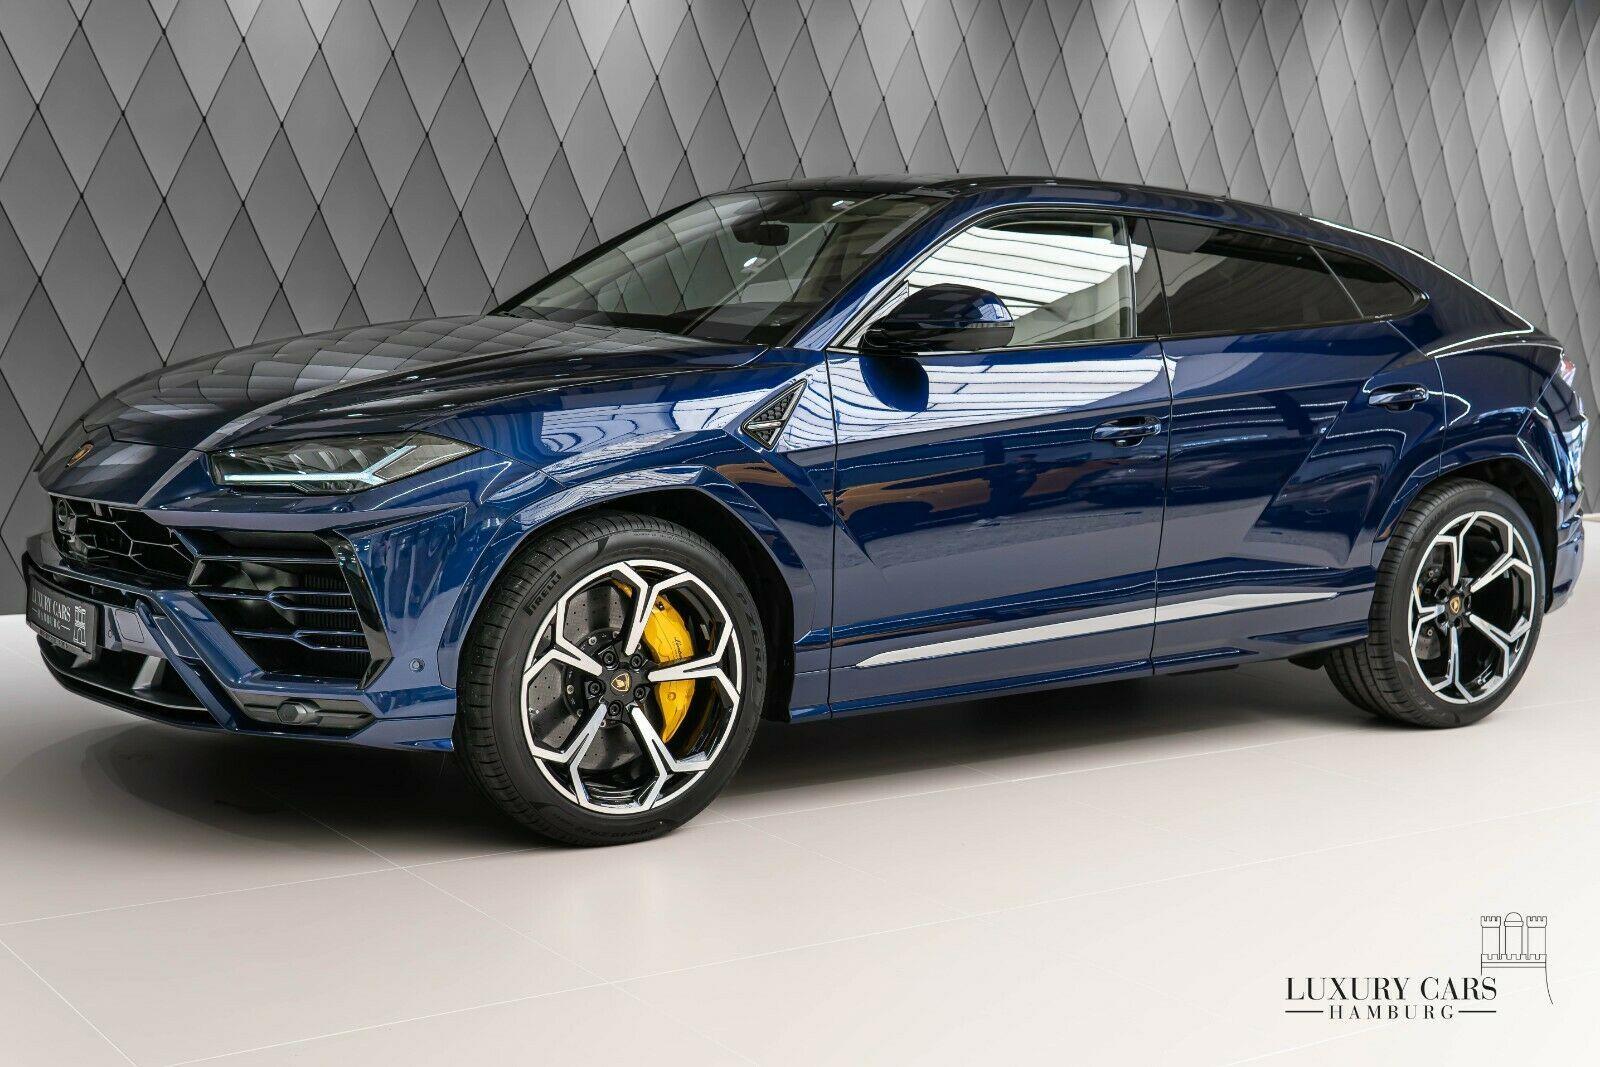 For Sale 2020 Lamborghini Urus Luxury Cars Hamburg United States For Sale On Luxurypulse Luxury Cars Lamborghini Luxury Suv